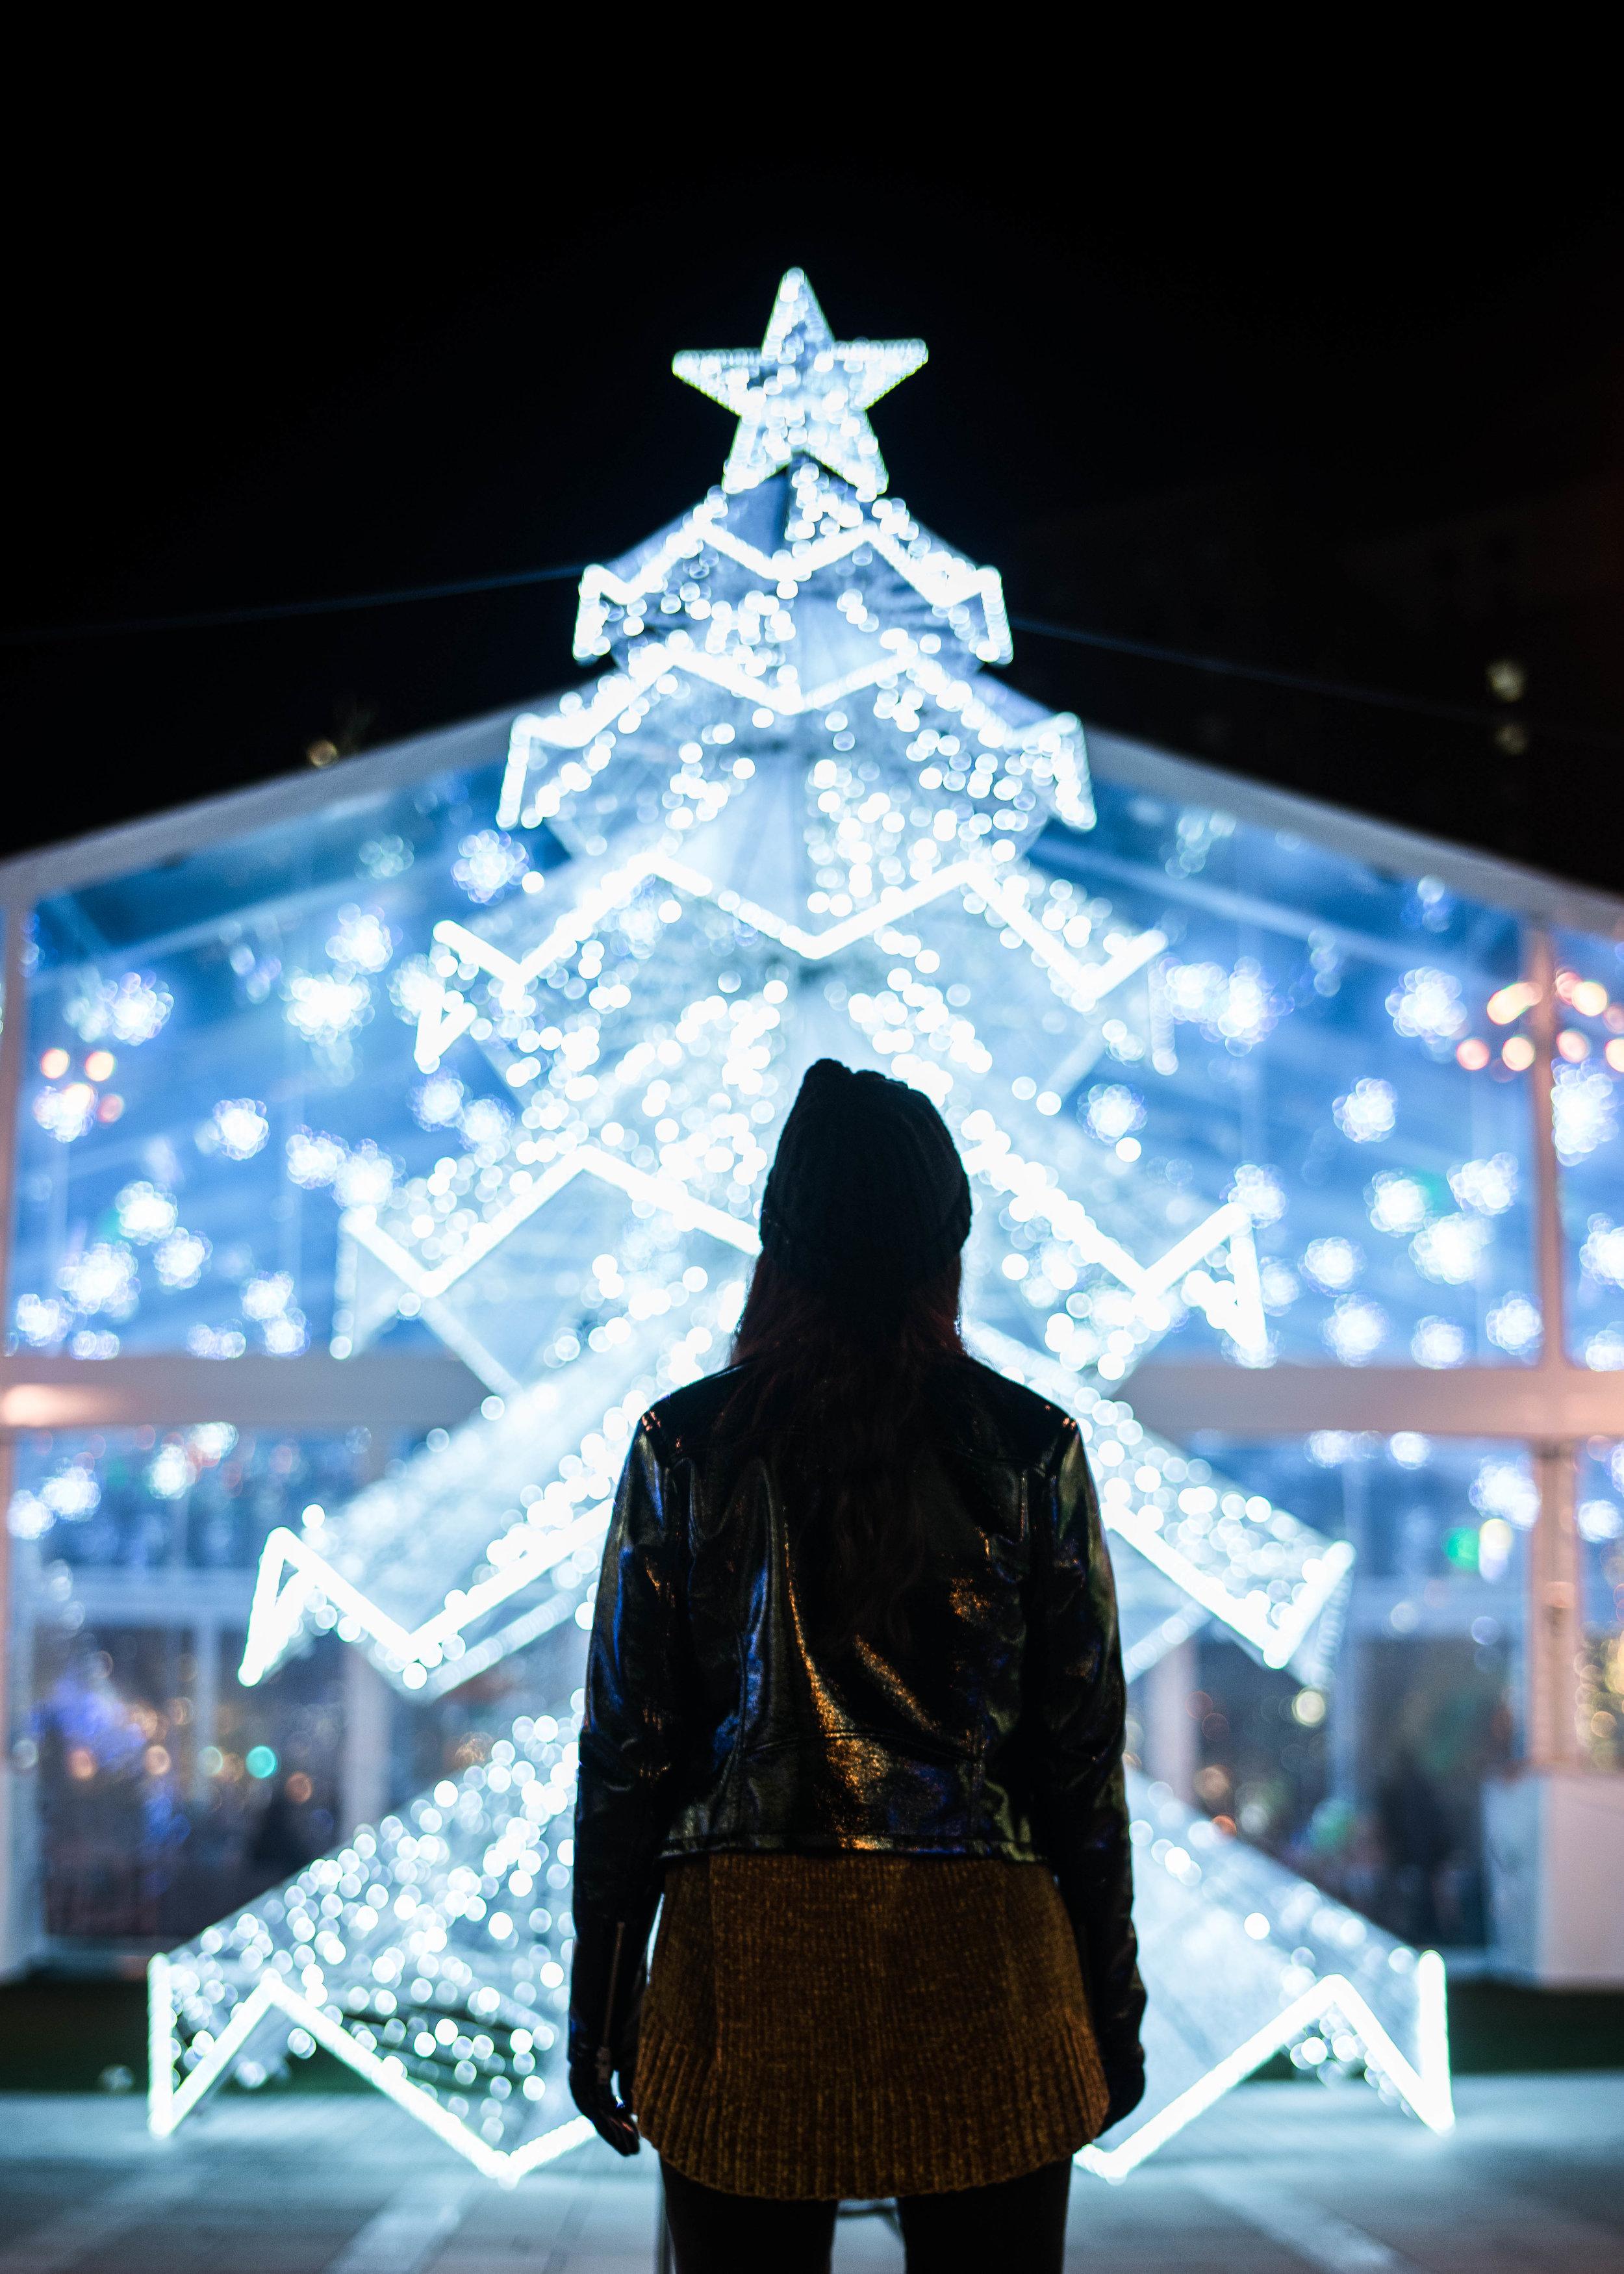 christmas tree | detroit | wonder | detroit photoshoot | holiday photo | holiday photoshoot | winter wonderland photo | christmas light photo | holiday bokeh | holiday mini session | christmas in detroit | kboothmedia